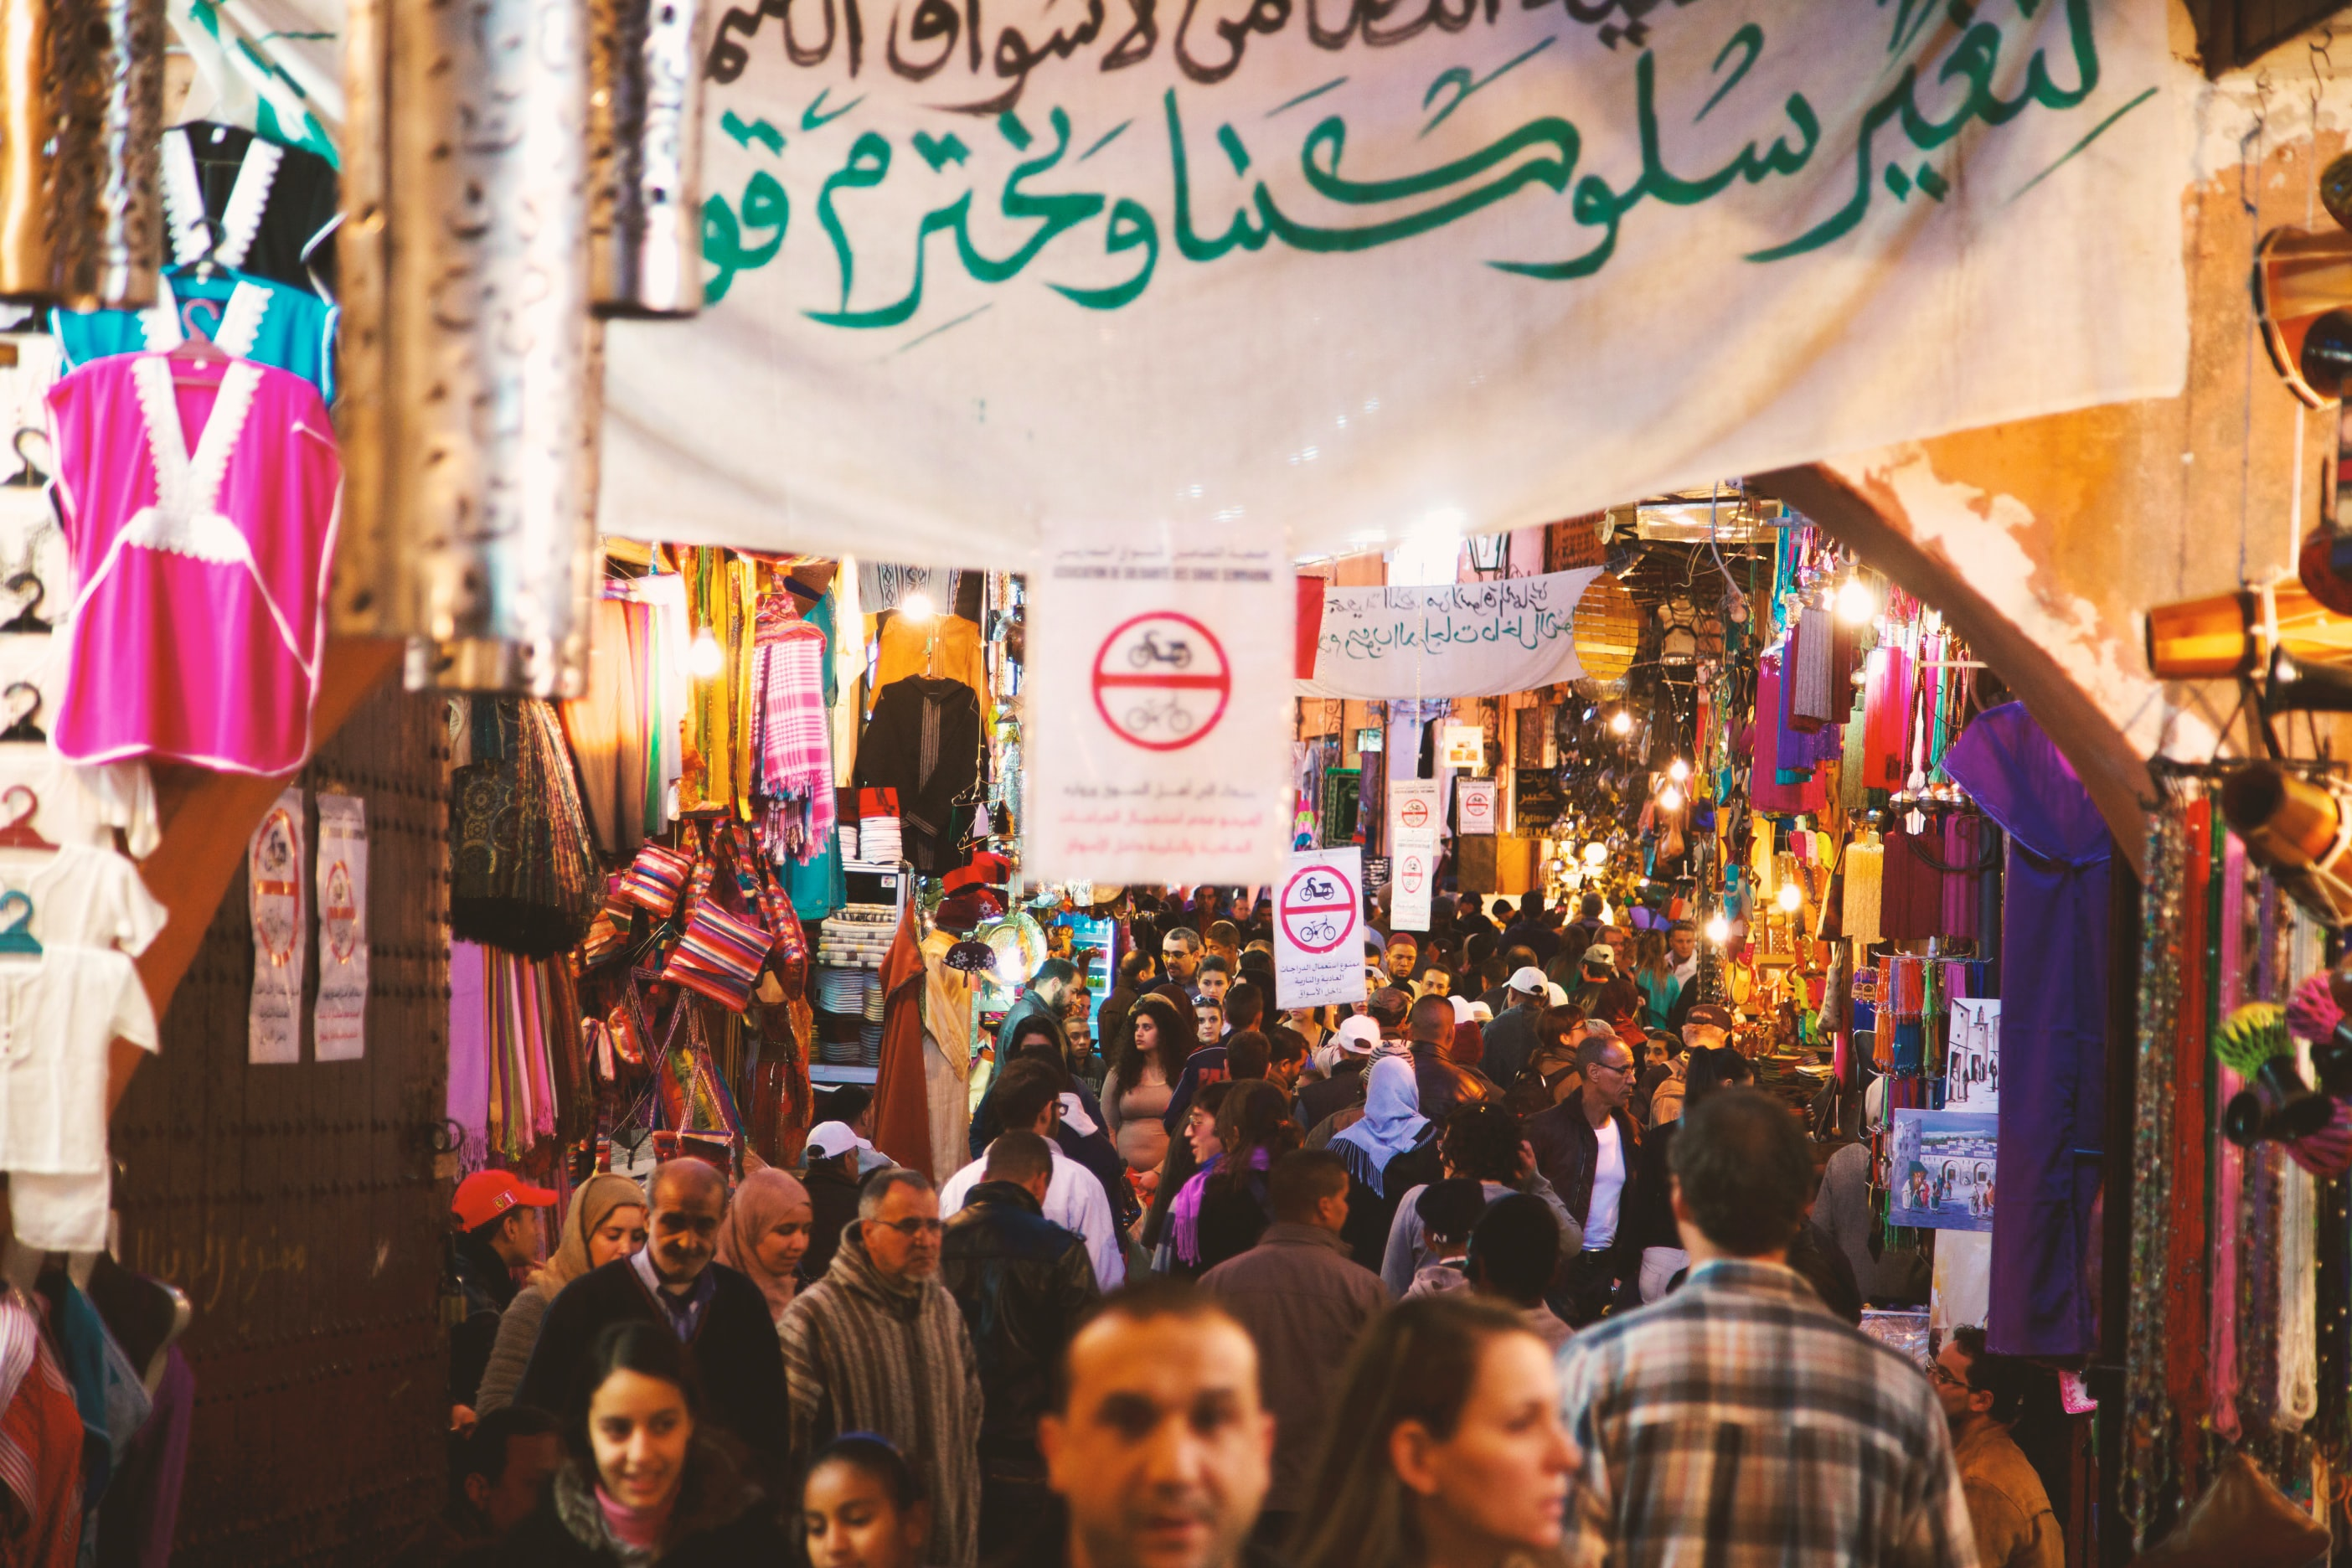 people at night market during night